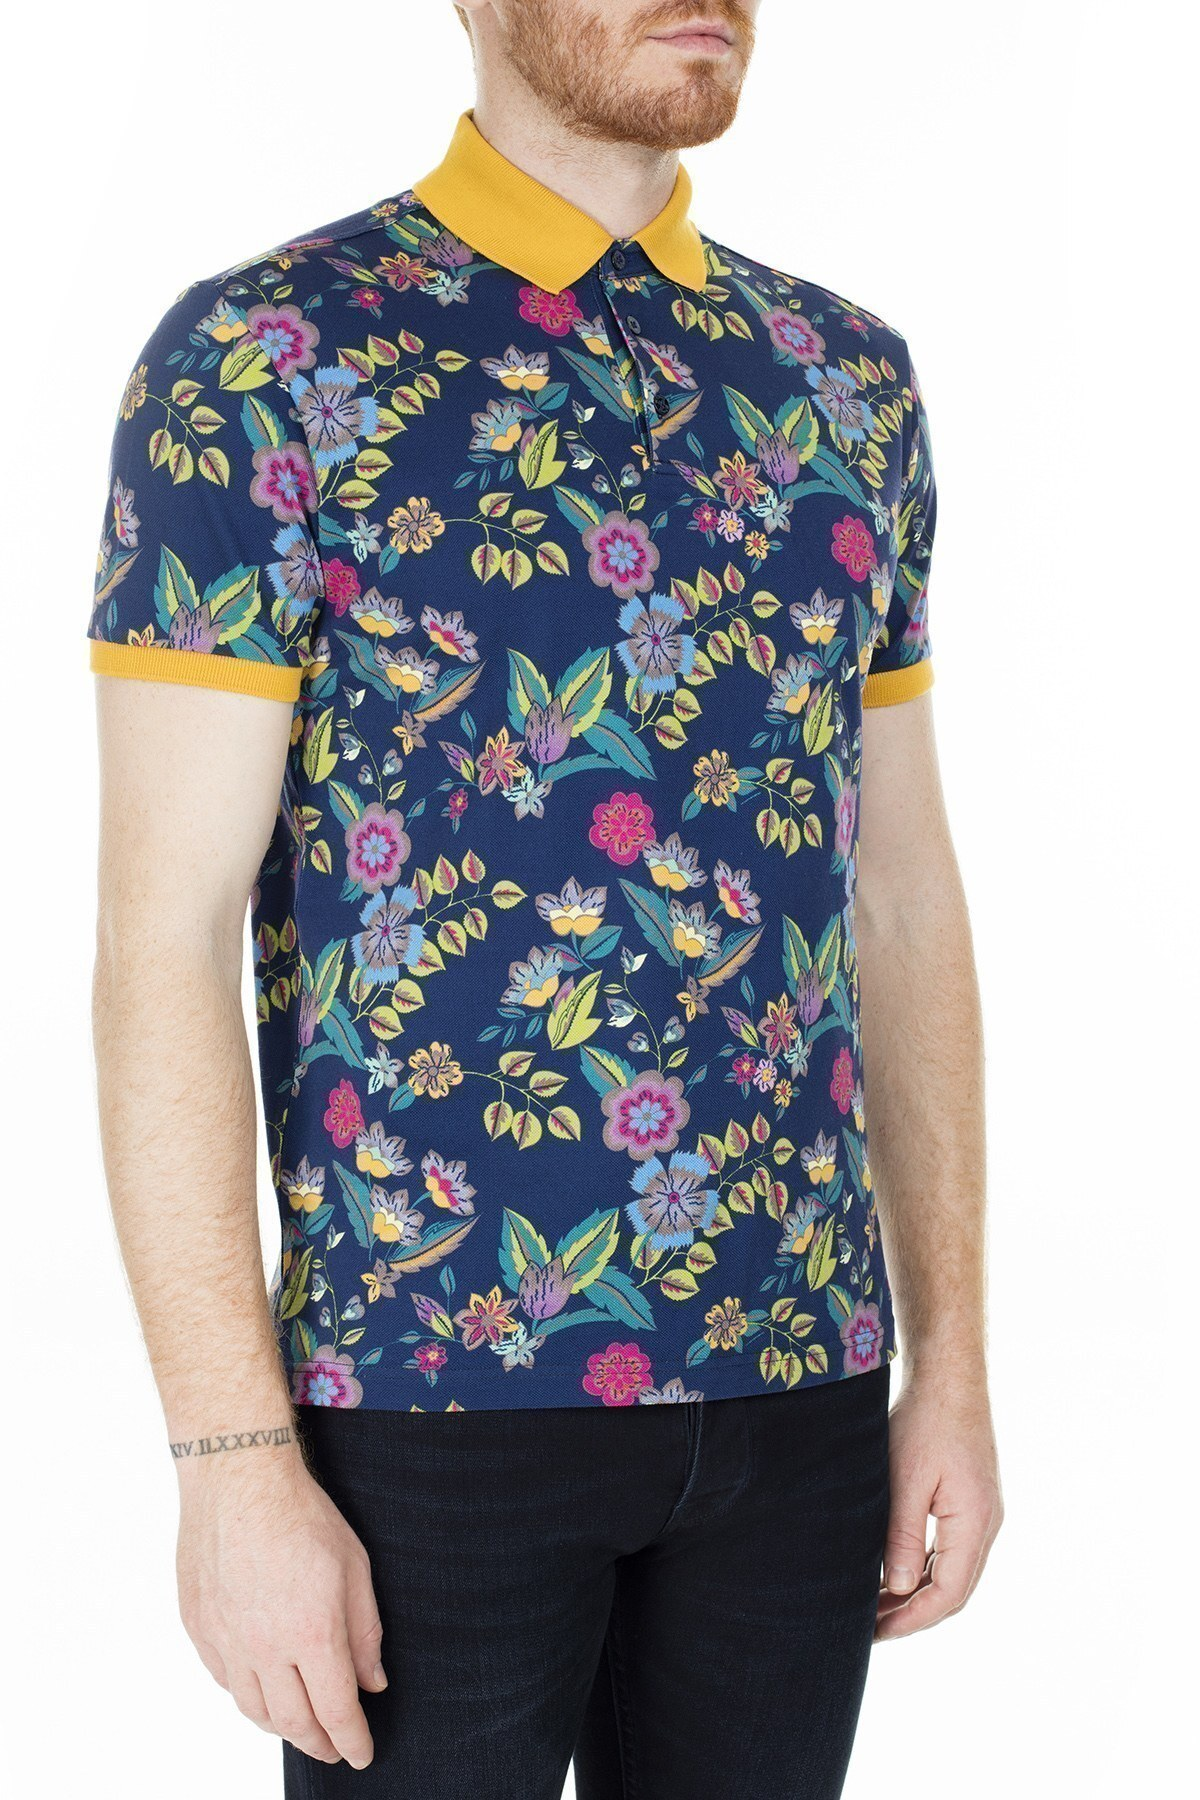 Etro Regular Fit T Shirt Erkek Polo 1Y800 4059 200 LACİVERT